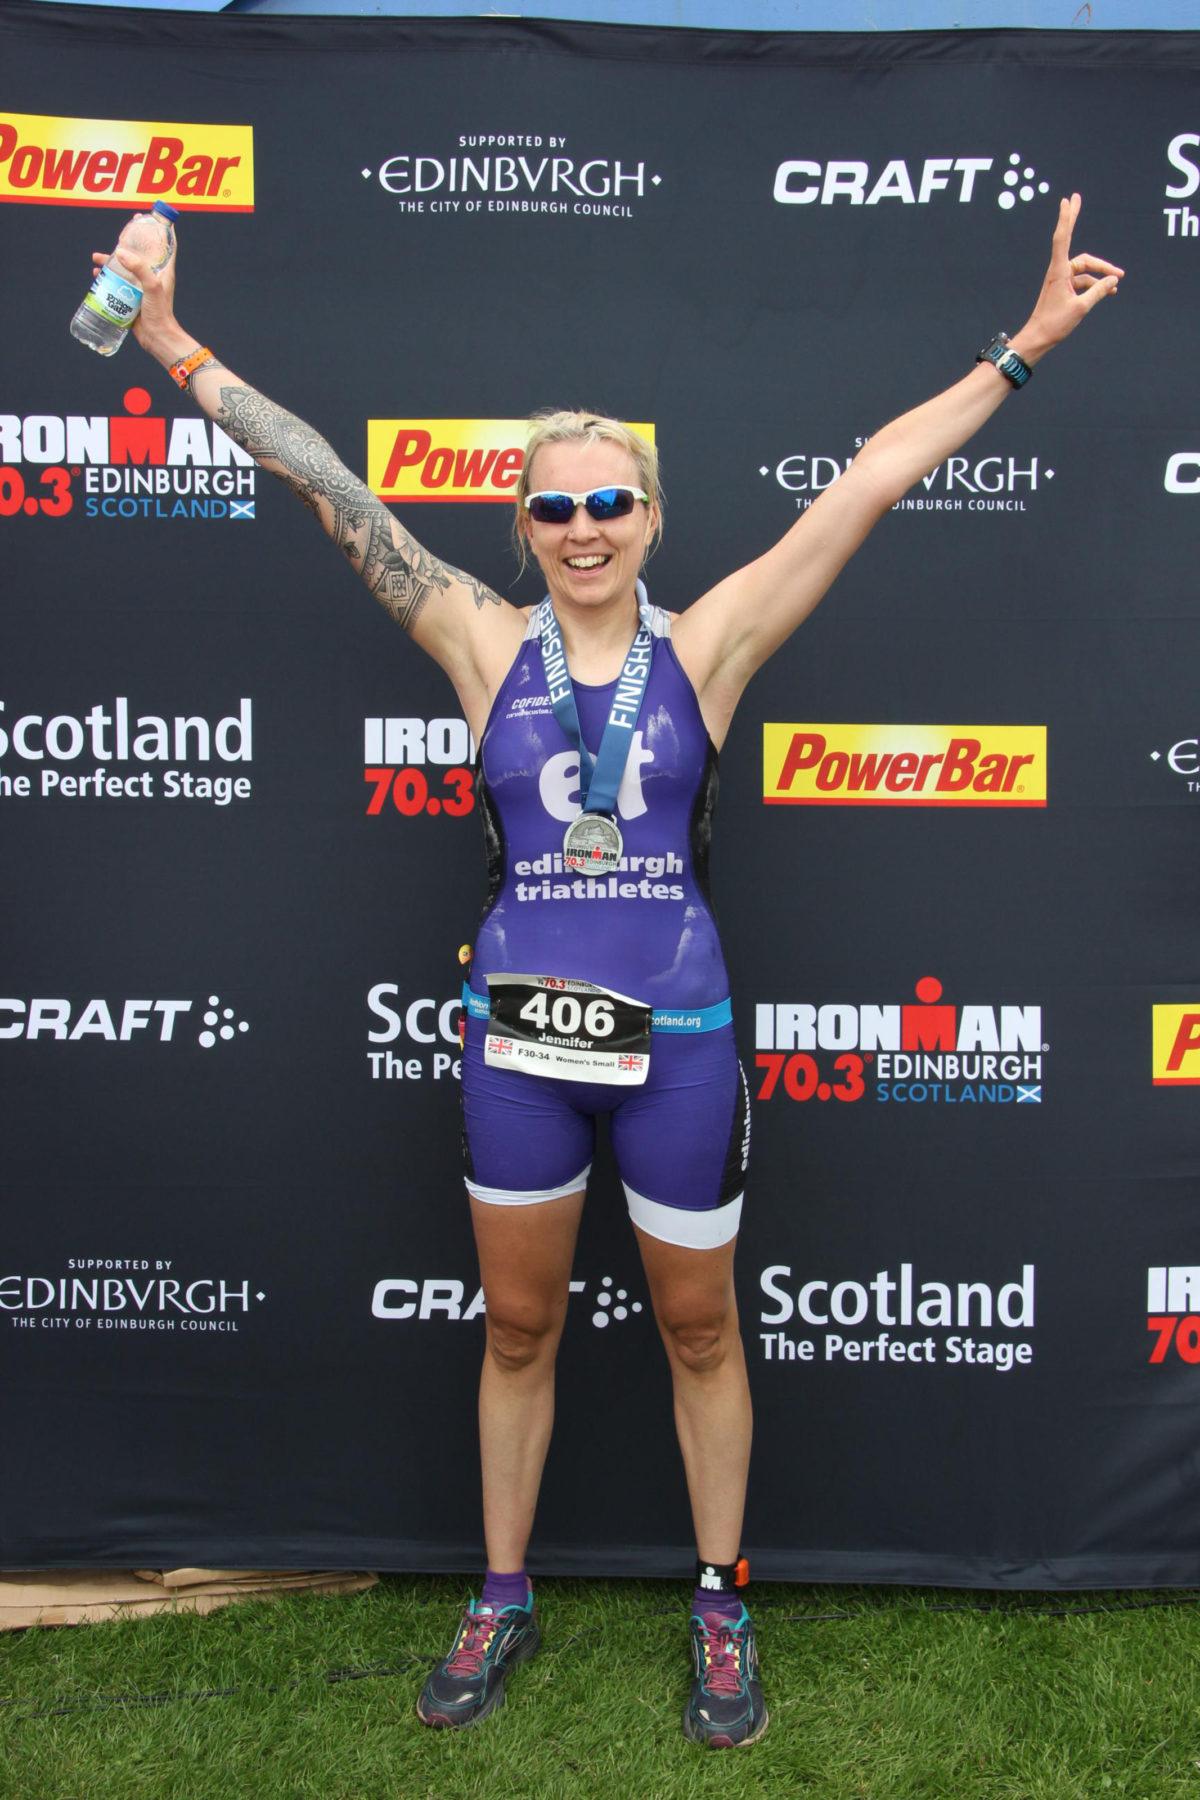 Edinburgh Ironman 70.3 Race Report